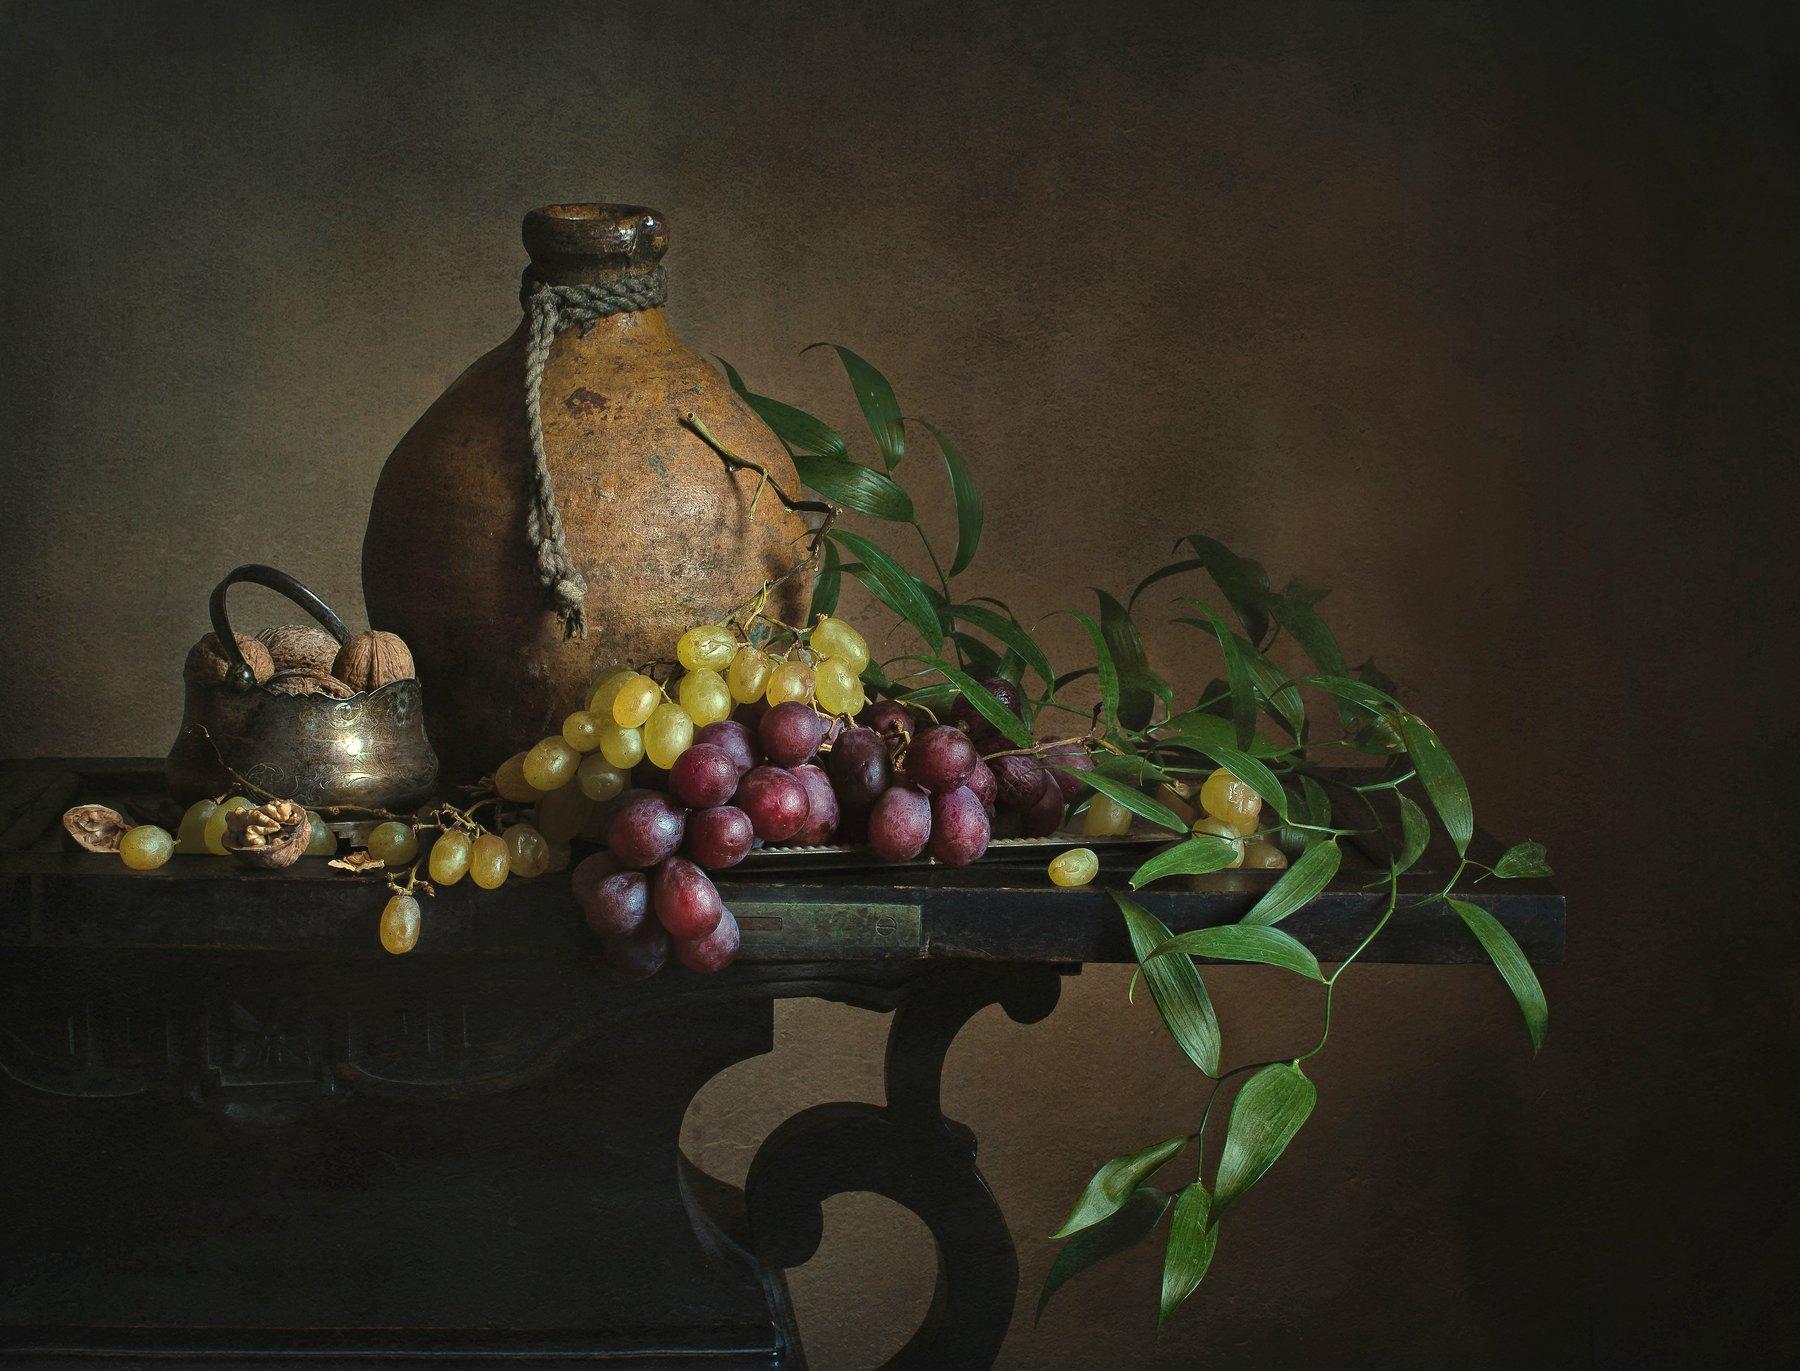 натюрморт, предметка, виноград, орехи, Анна Петина